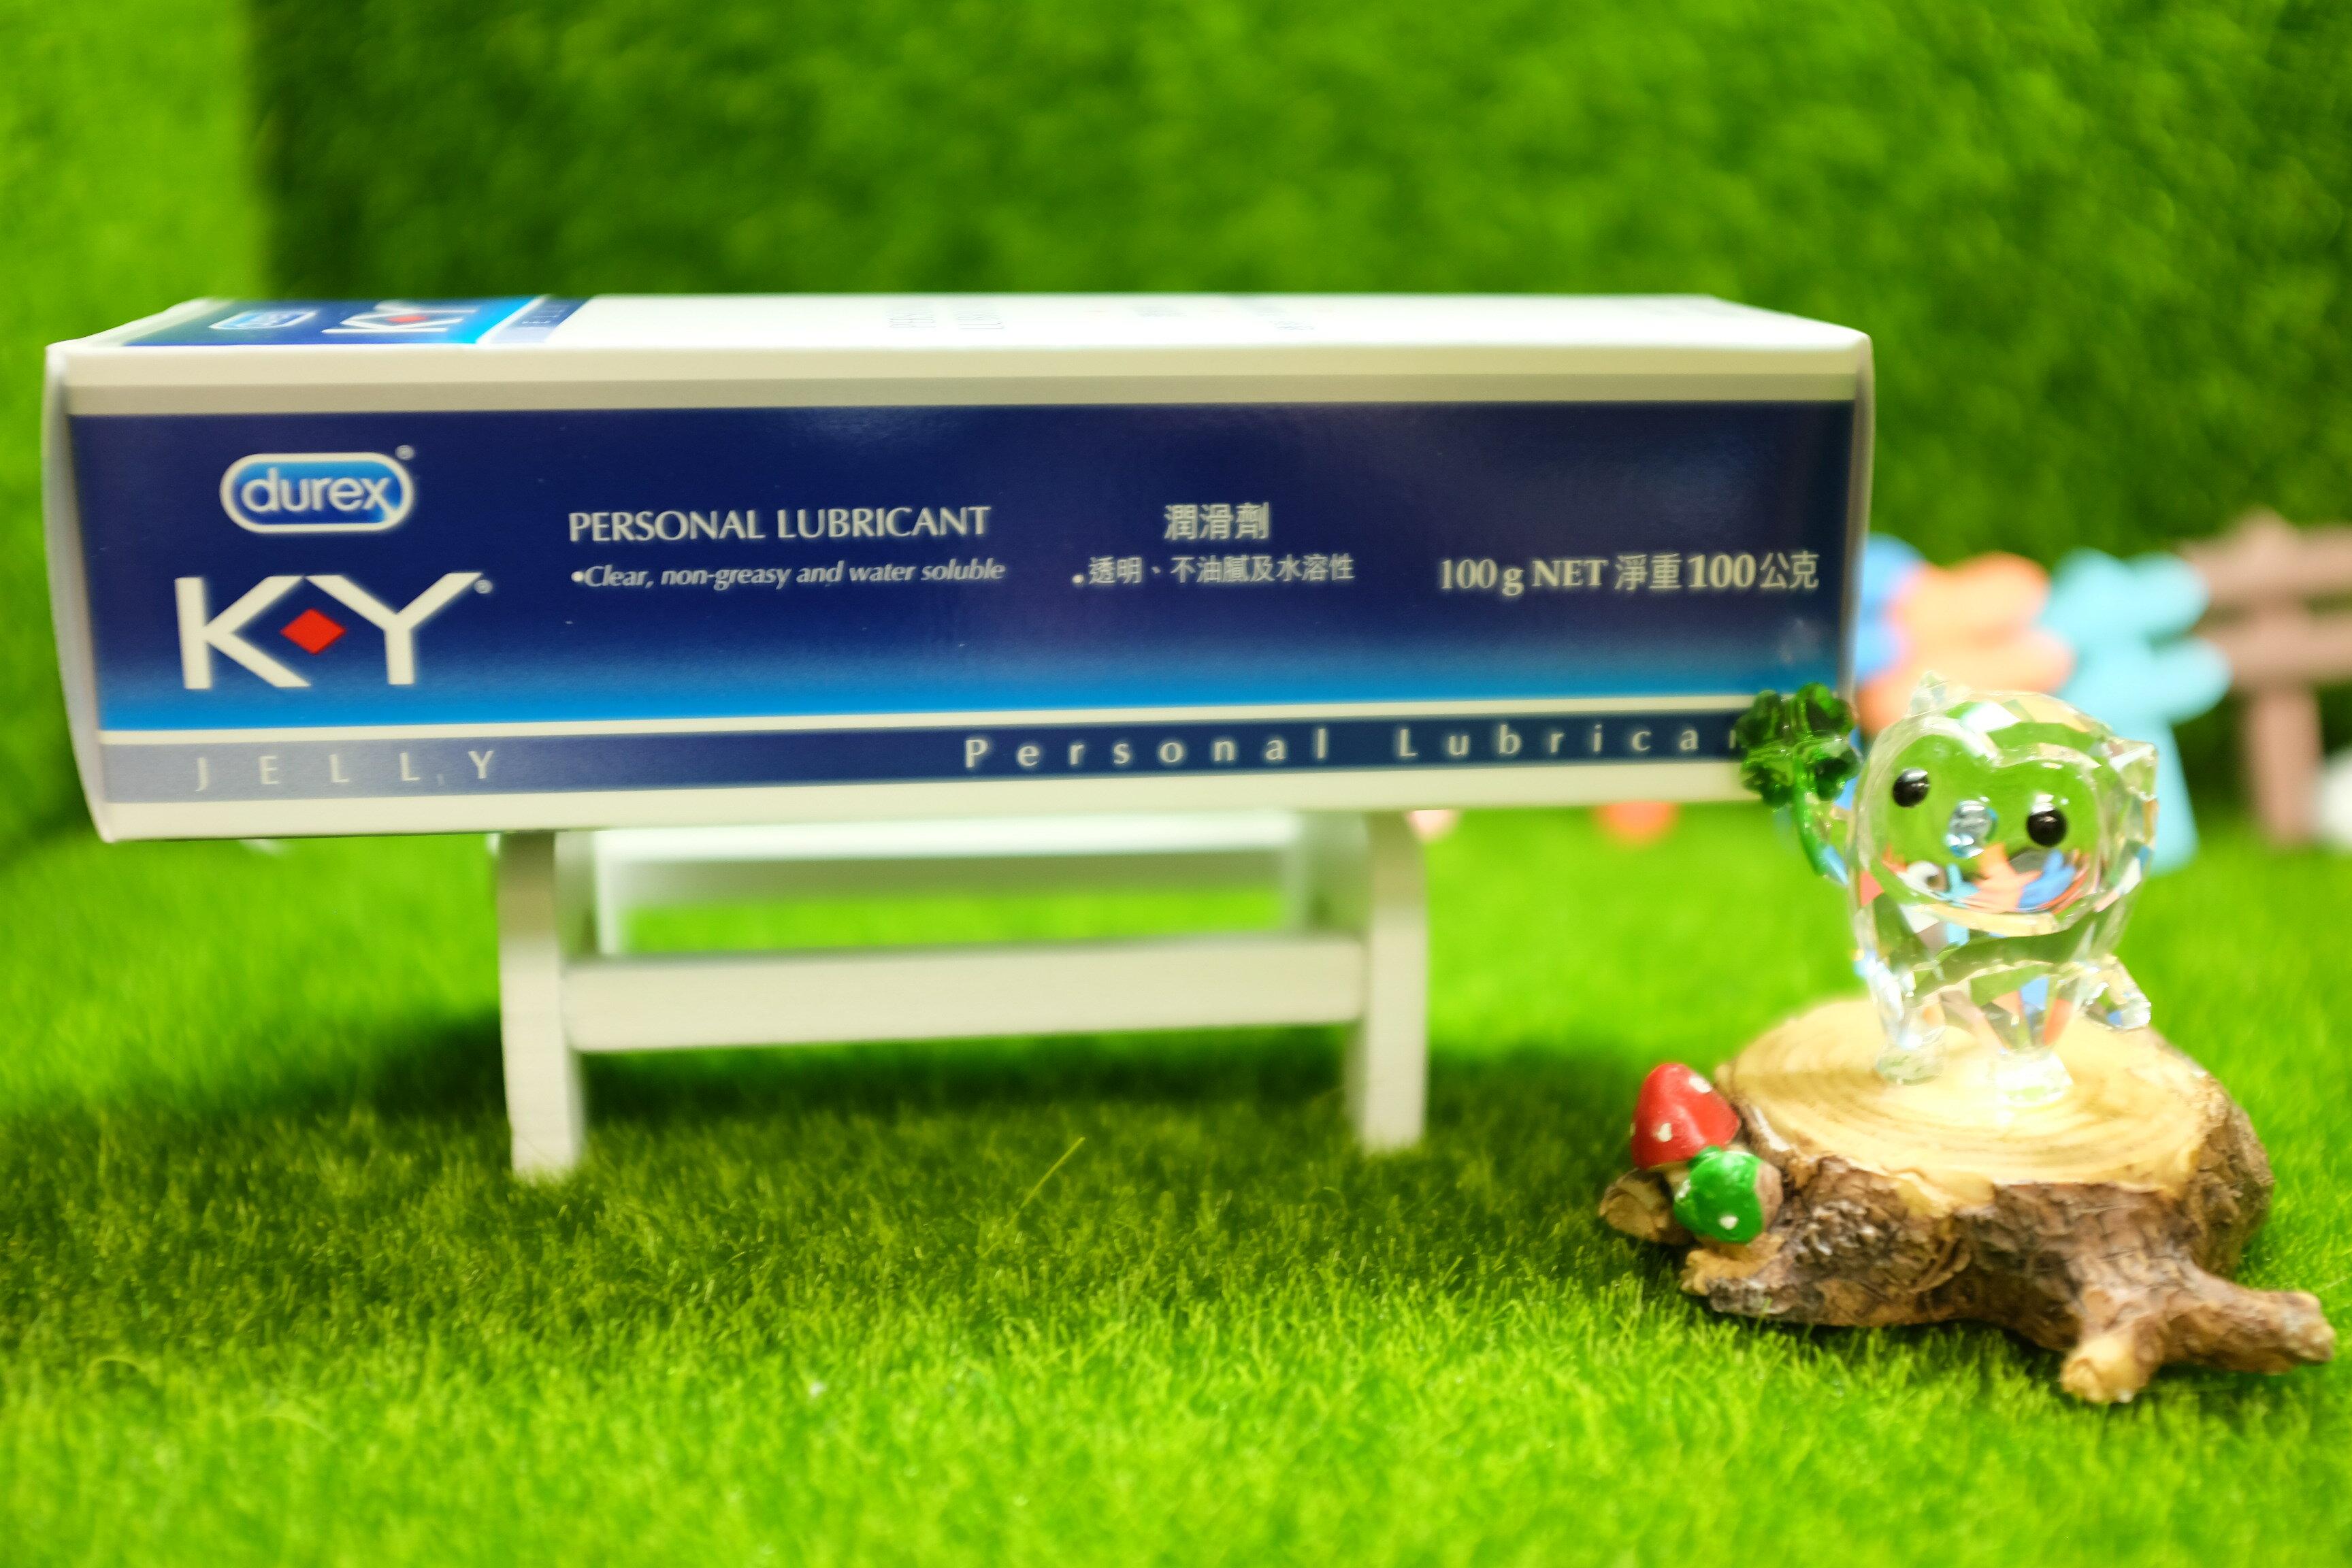 KY潤滑劑 100g#隱密包裝 原廠台灣公司貨 durex